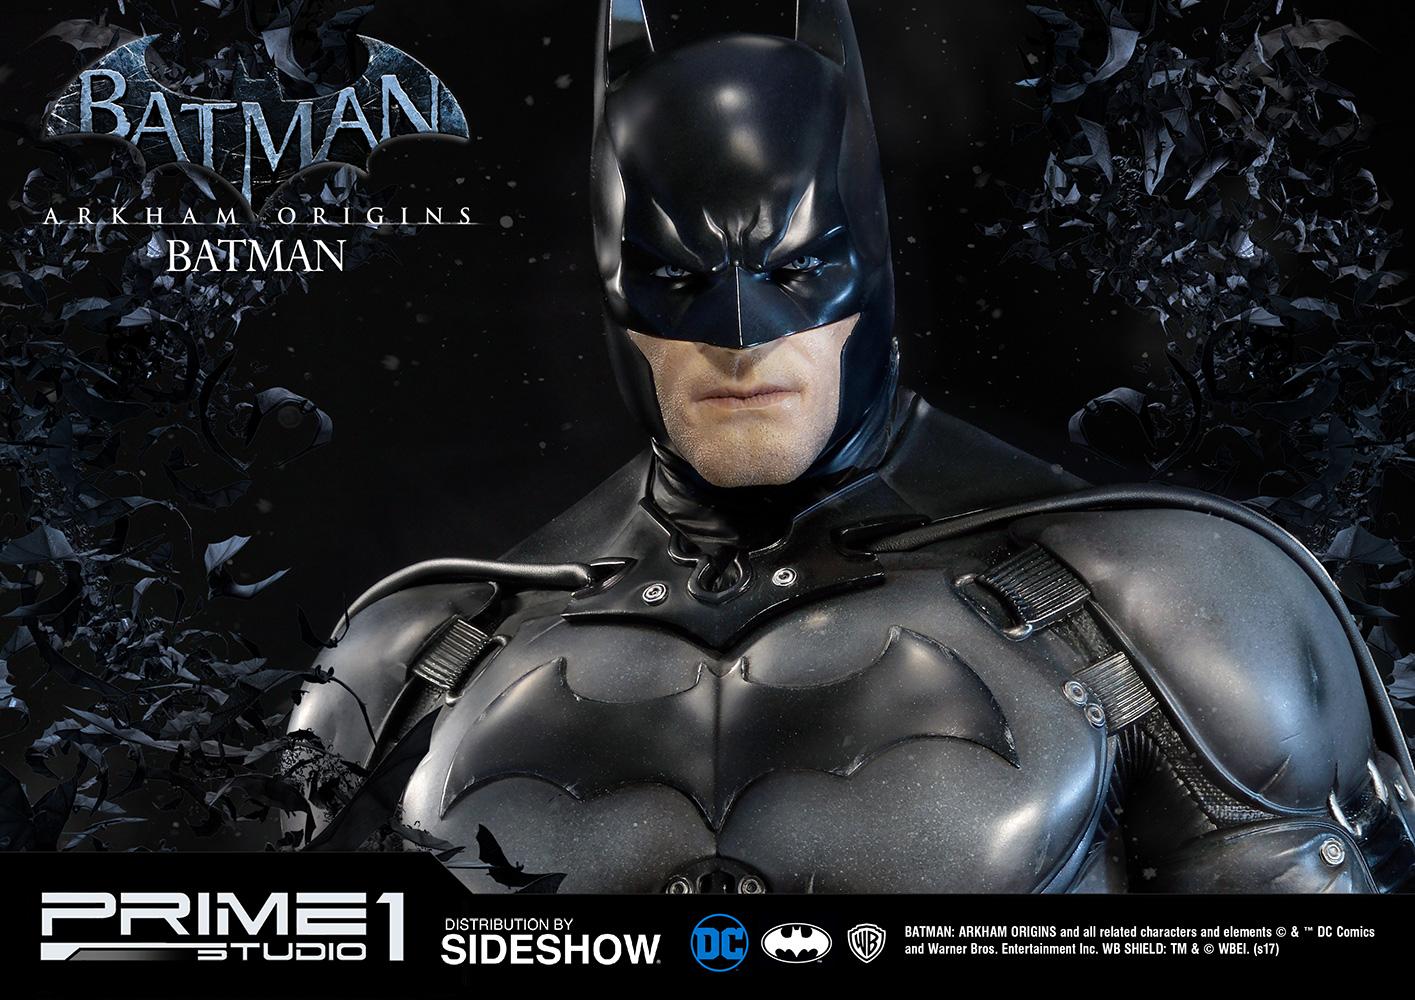 Prime 1 Studio Arkham Origins Batman Statue – Sideshow Exclusive Version Pre-Order